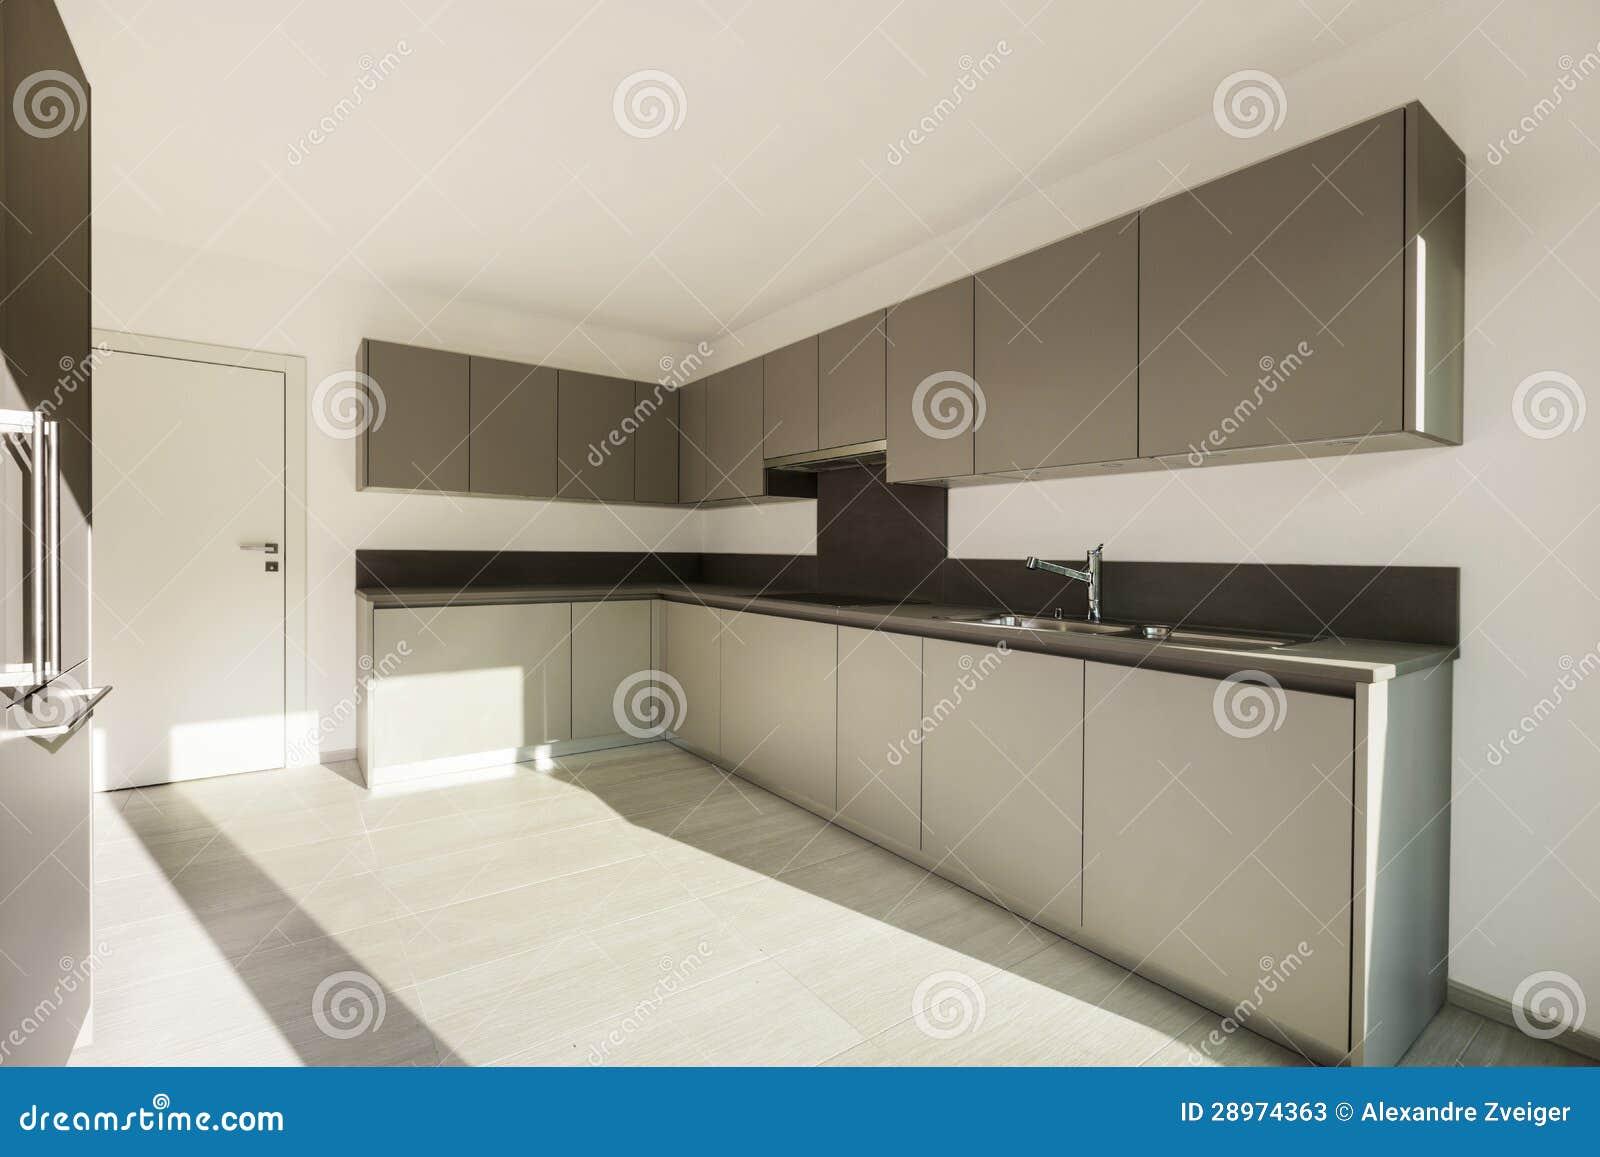 Binnenlandse moderne keuken stock afbeelding afbeelding 28974363 - Moderne keukenfotos ...